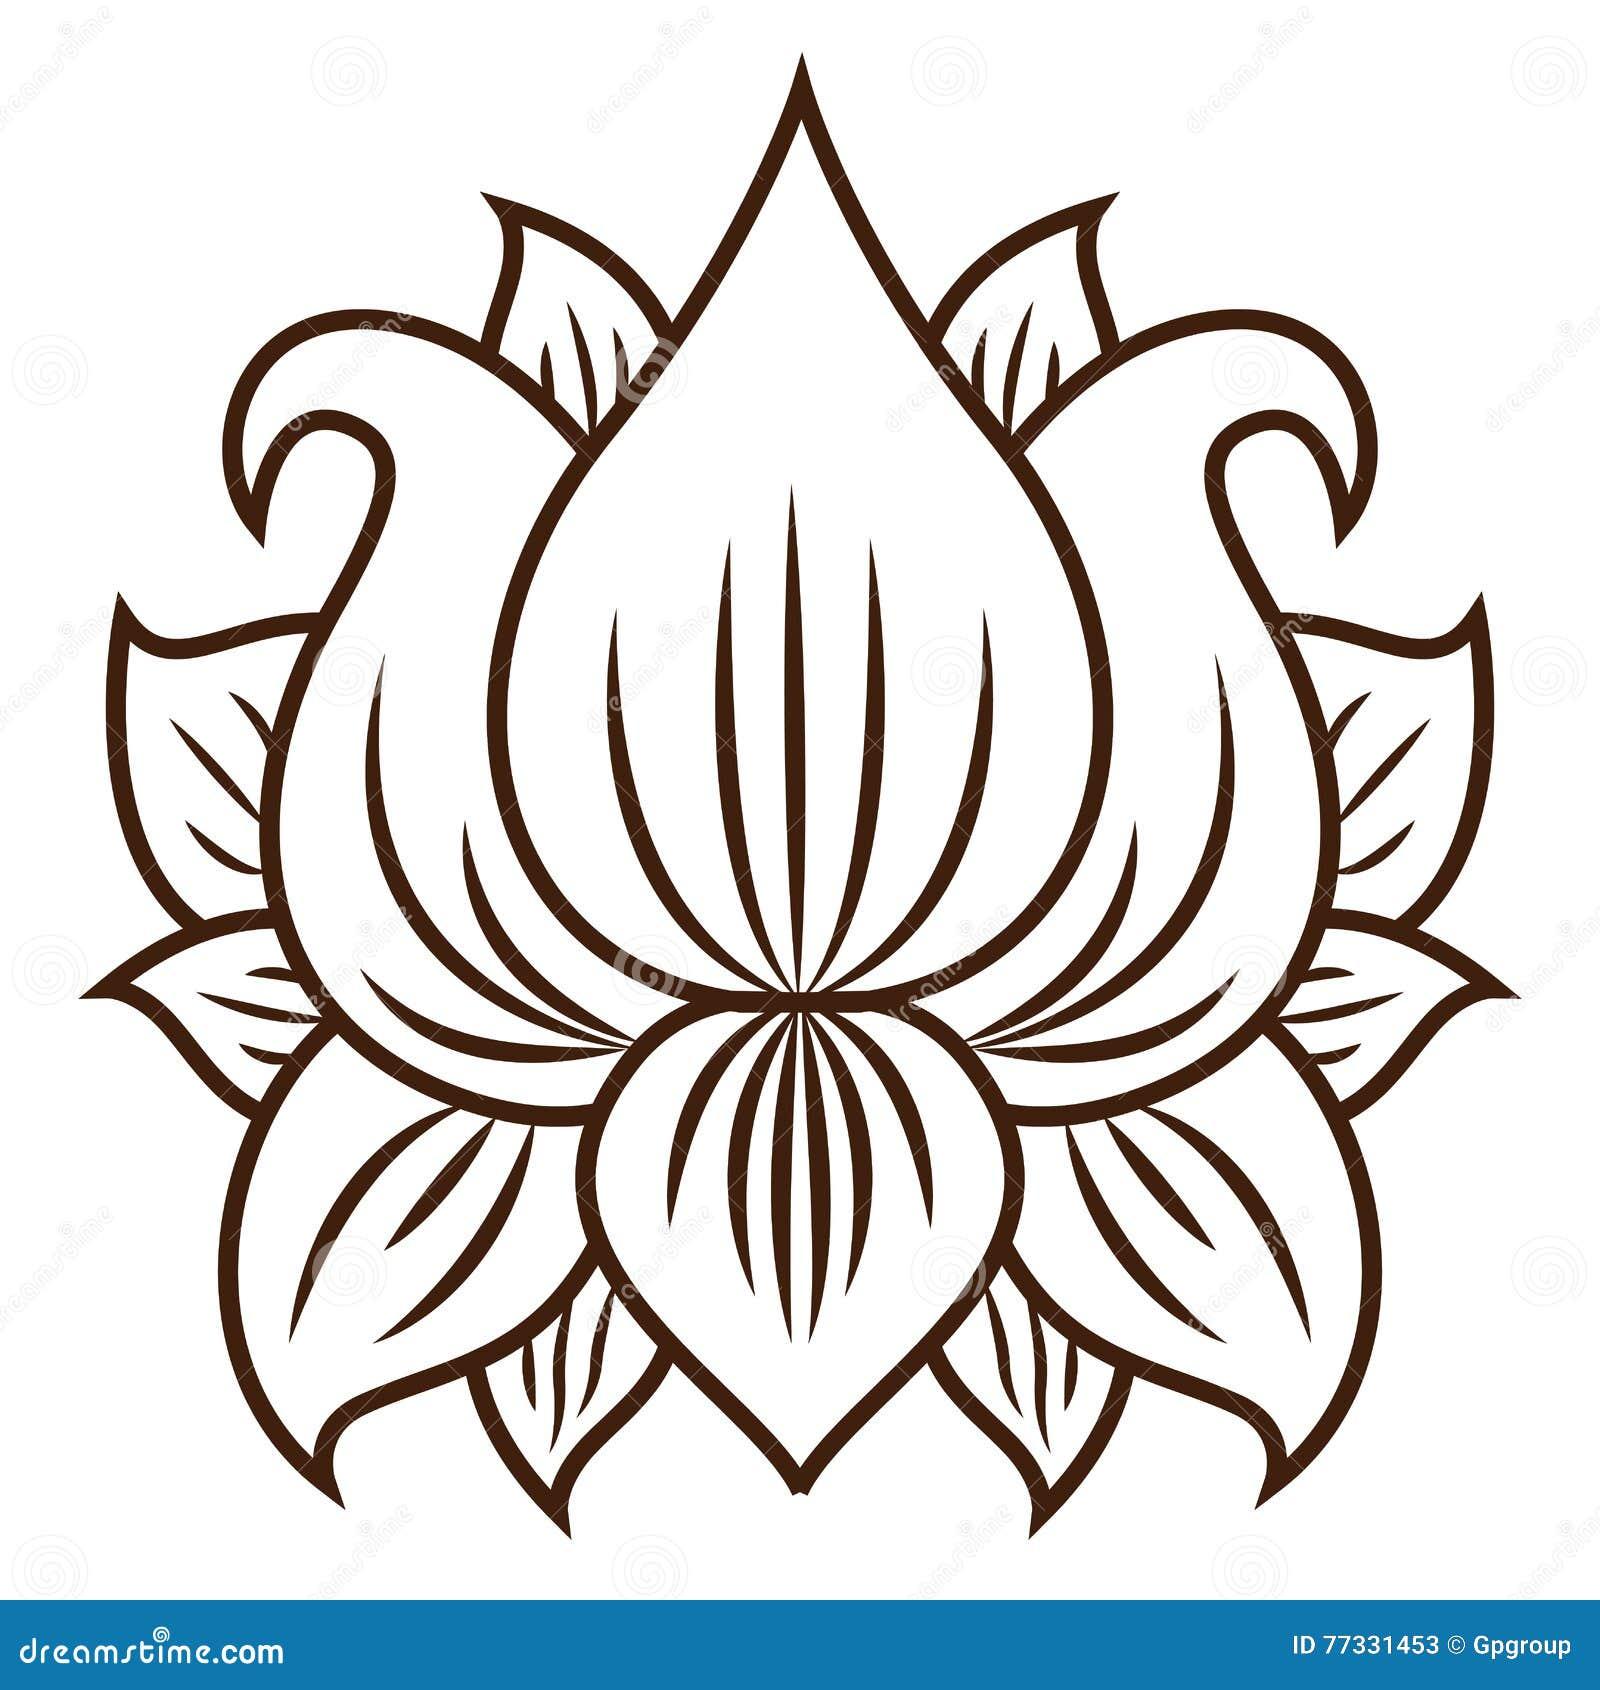 Isolated lotus flower design stock vector illustration of botany isolated lotus flower design izmirmasajfo